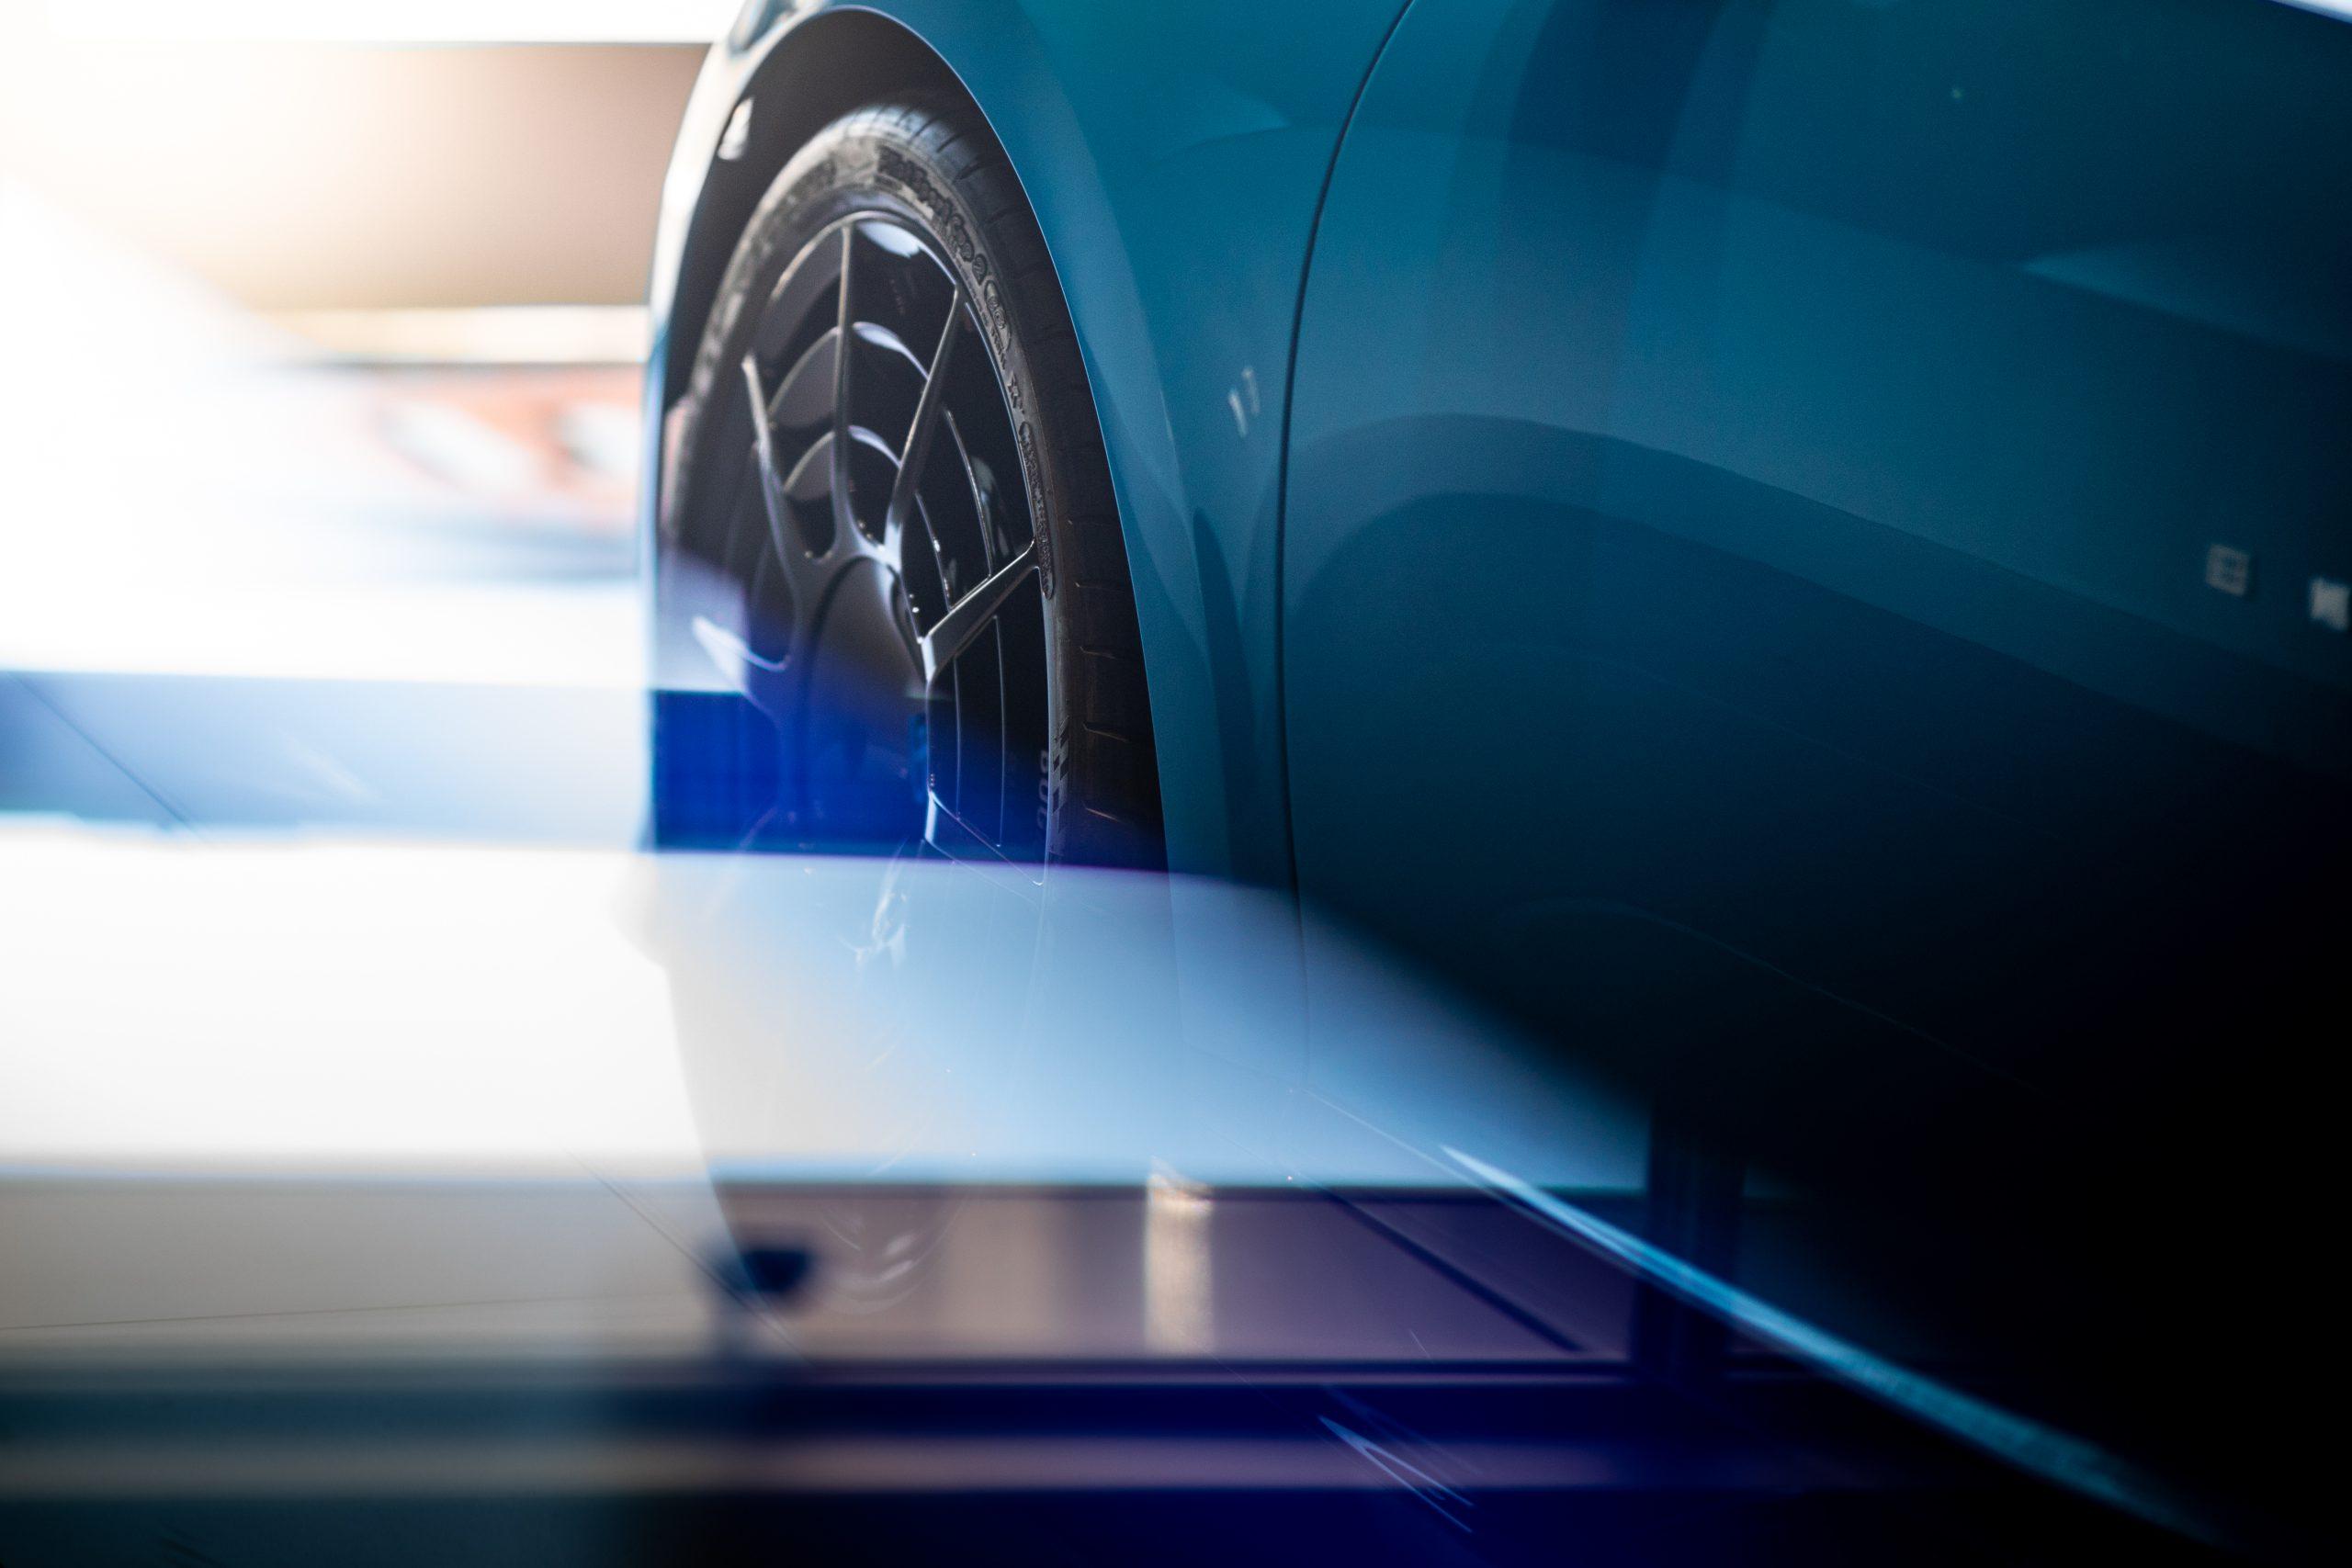 Bugatti-Chiron-Pur-Sport-show-car-7